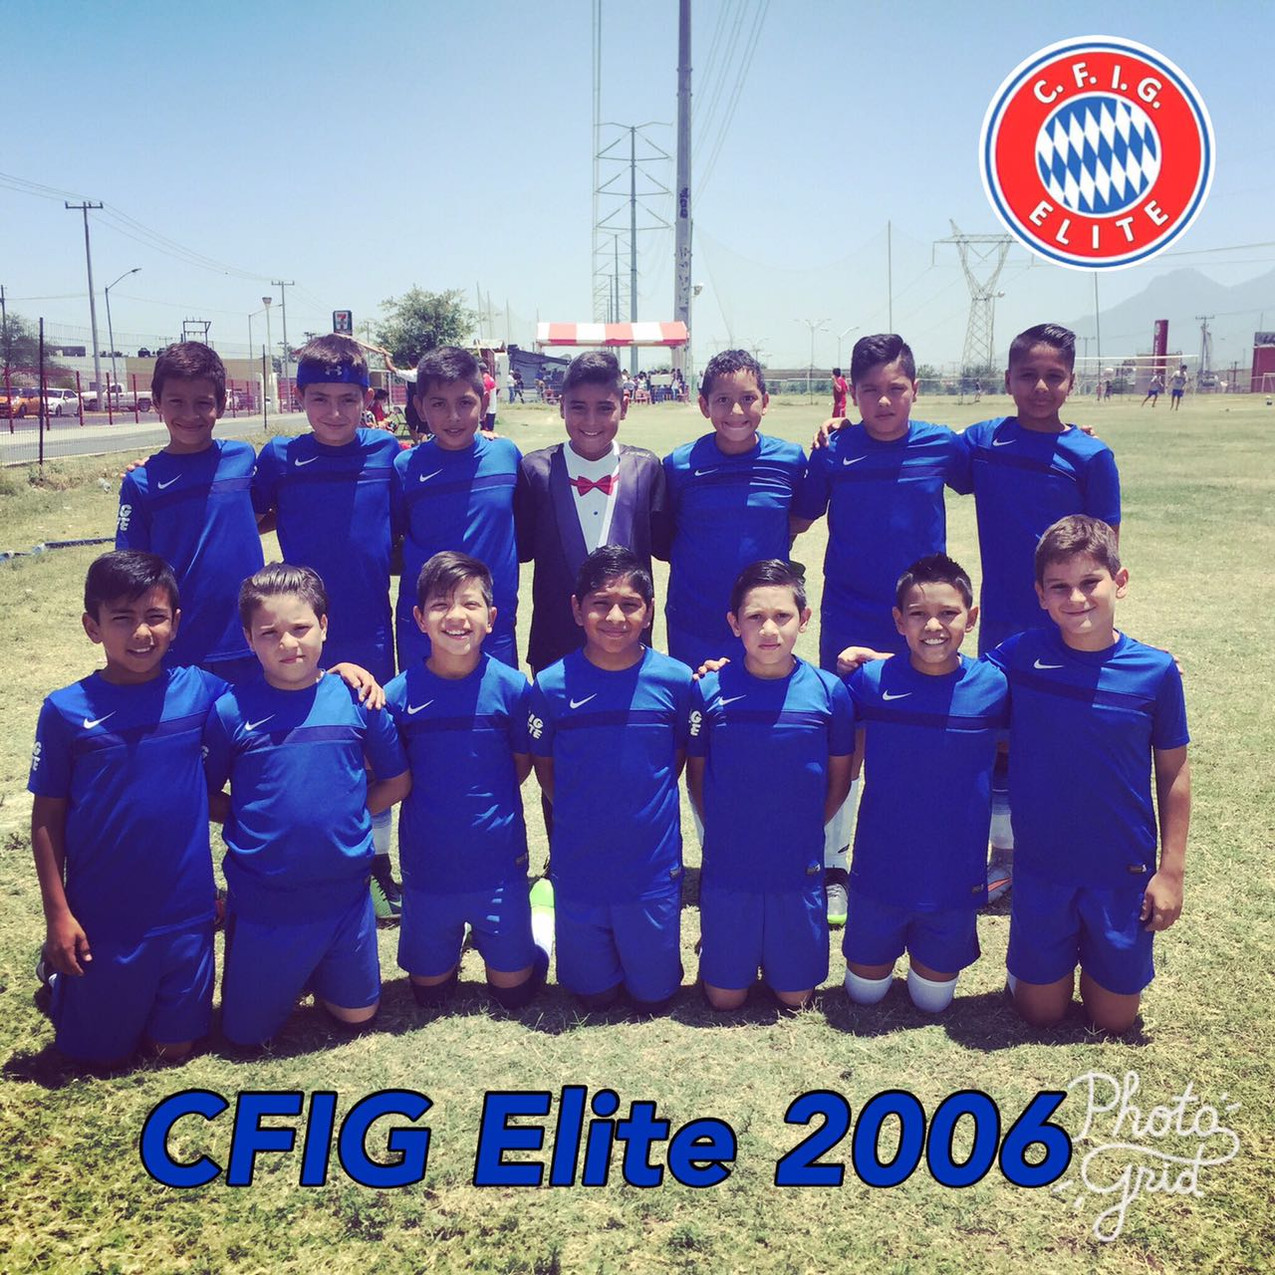 CFIG Elite 2006